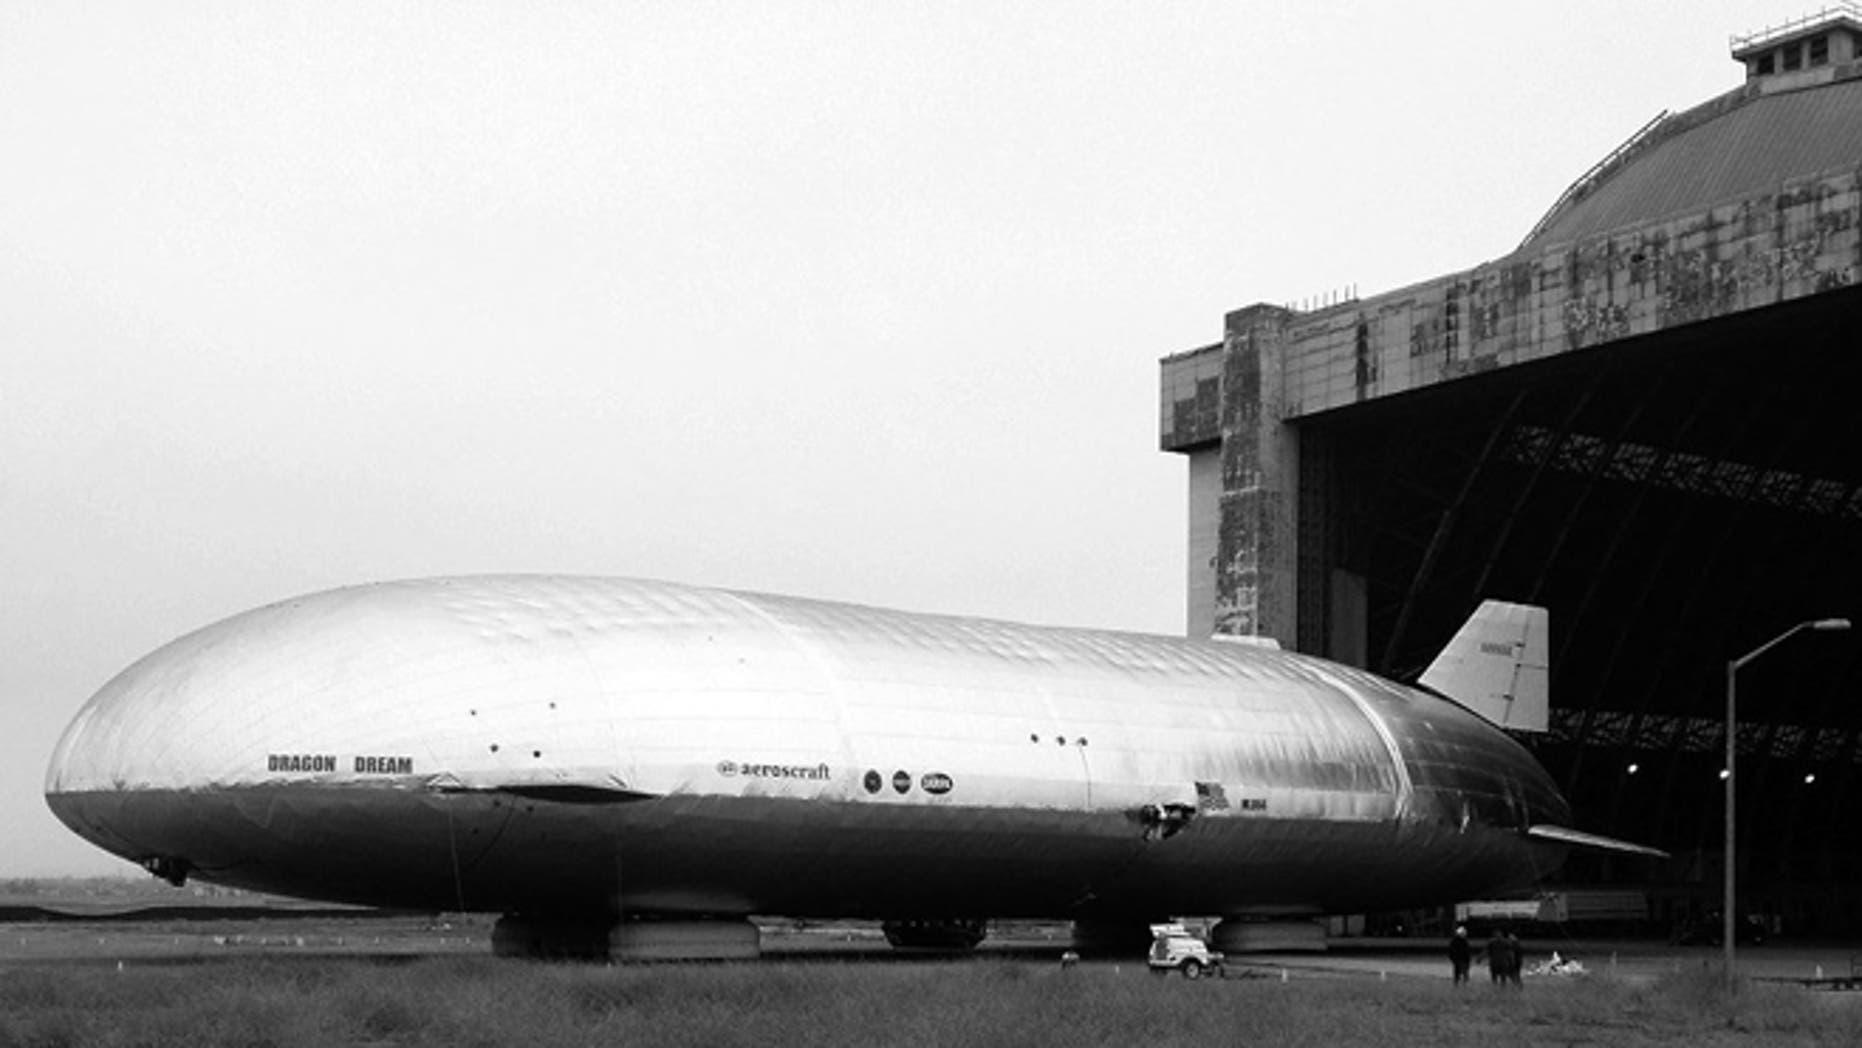 The Aeroscraft at its storage hangar at a Navy-operated facility in Southern California.